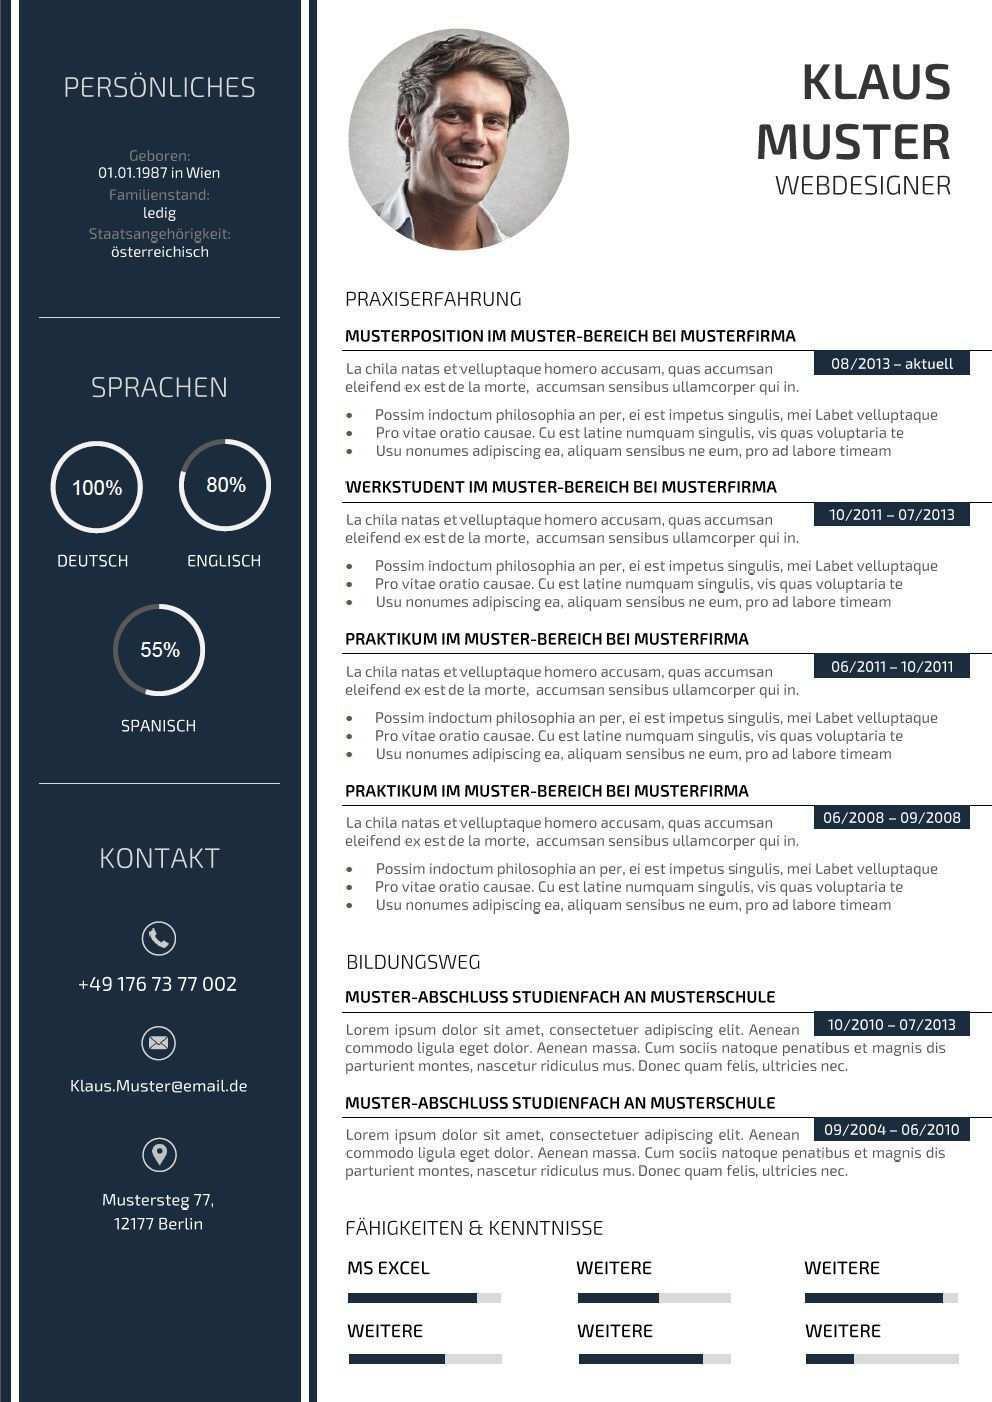 Premium Bewerbungsmuster 3 Lebenslauf Designs Vorlagen Lebenslauf Lebenslauf Design Kreativer Lebenslauf